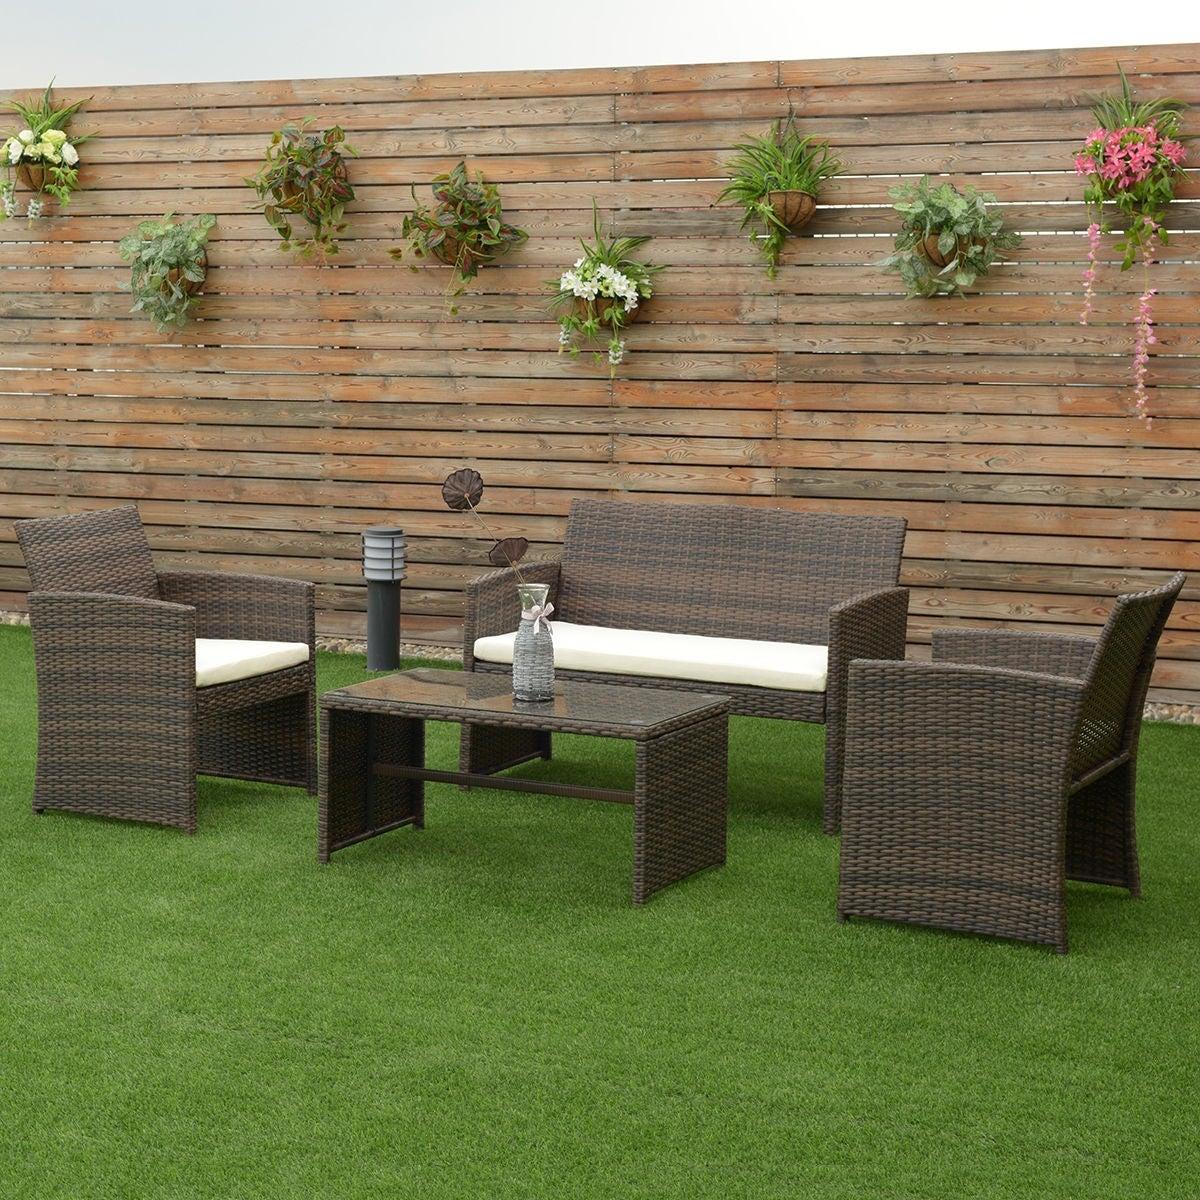 Shop Costway 4 PCS Outdoor Patio Rattan Wicker Furniture Set Table ...